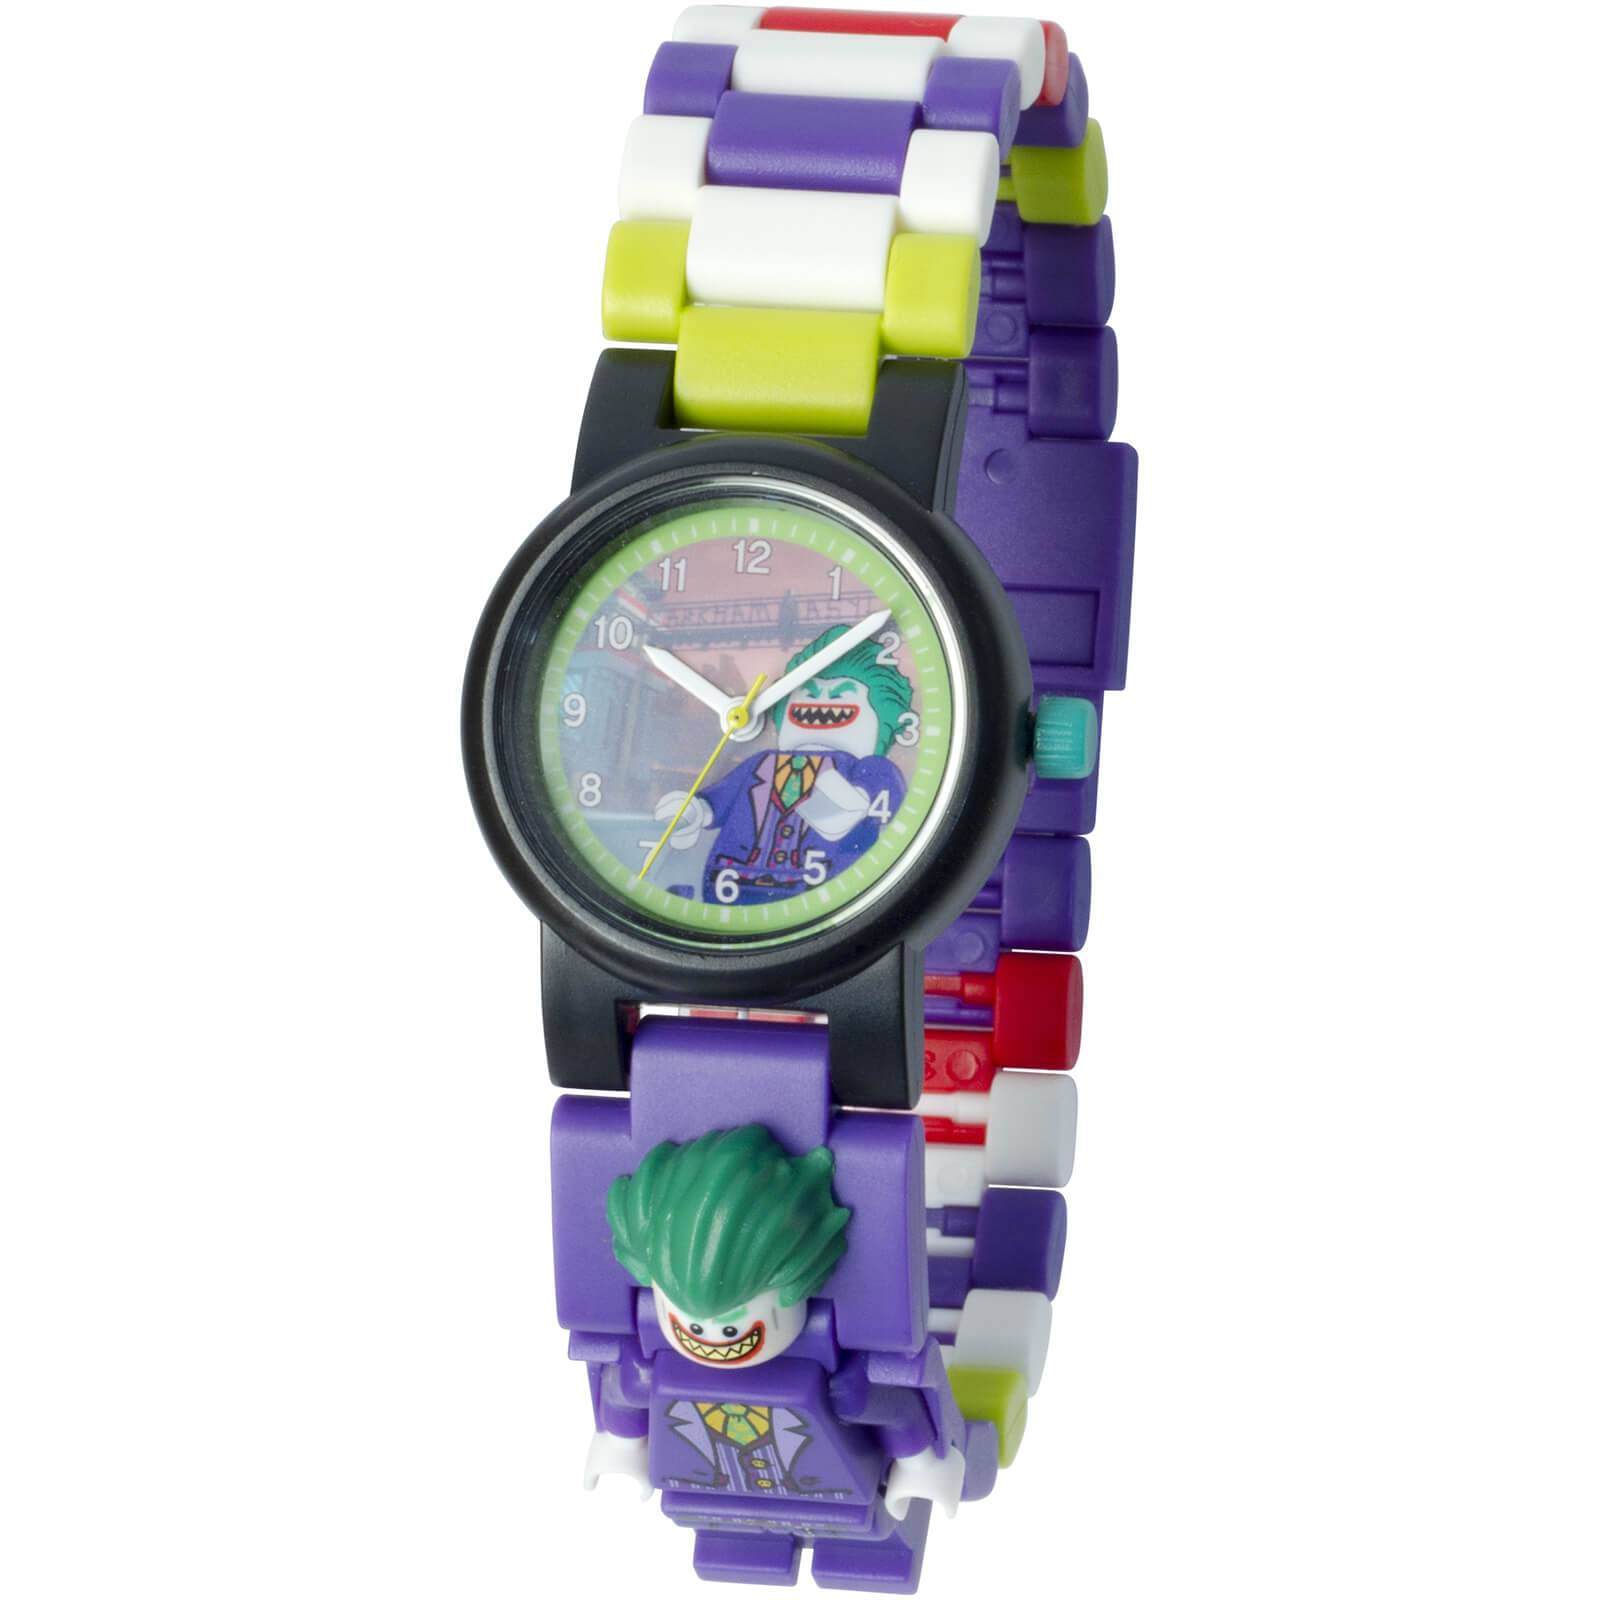 Lego Batman Movie: The Joker Minifigure Link Watch